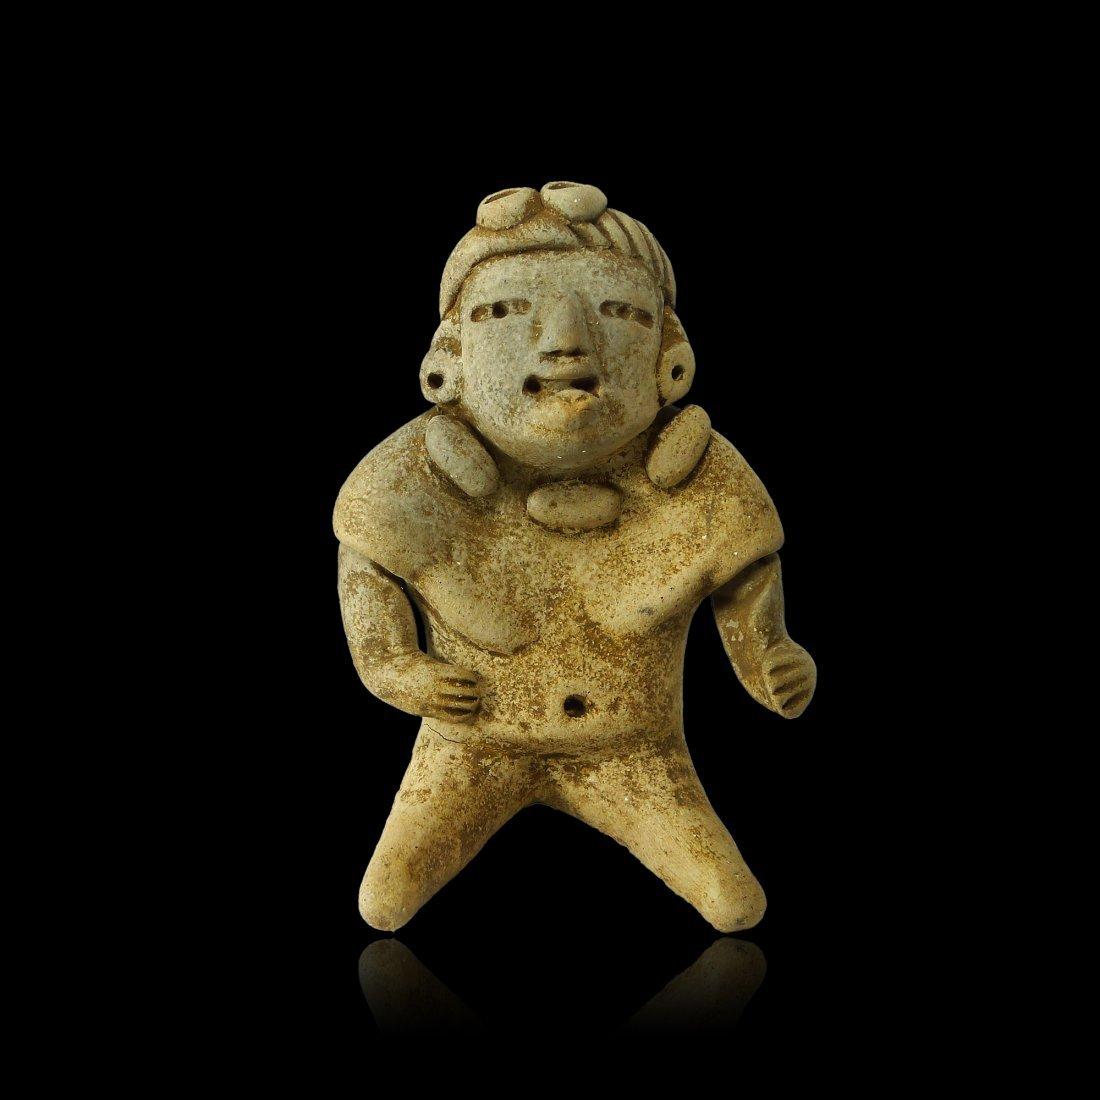 Rare Pre-Maya Olmecoid Articulated Figure